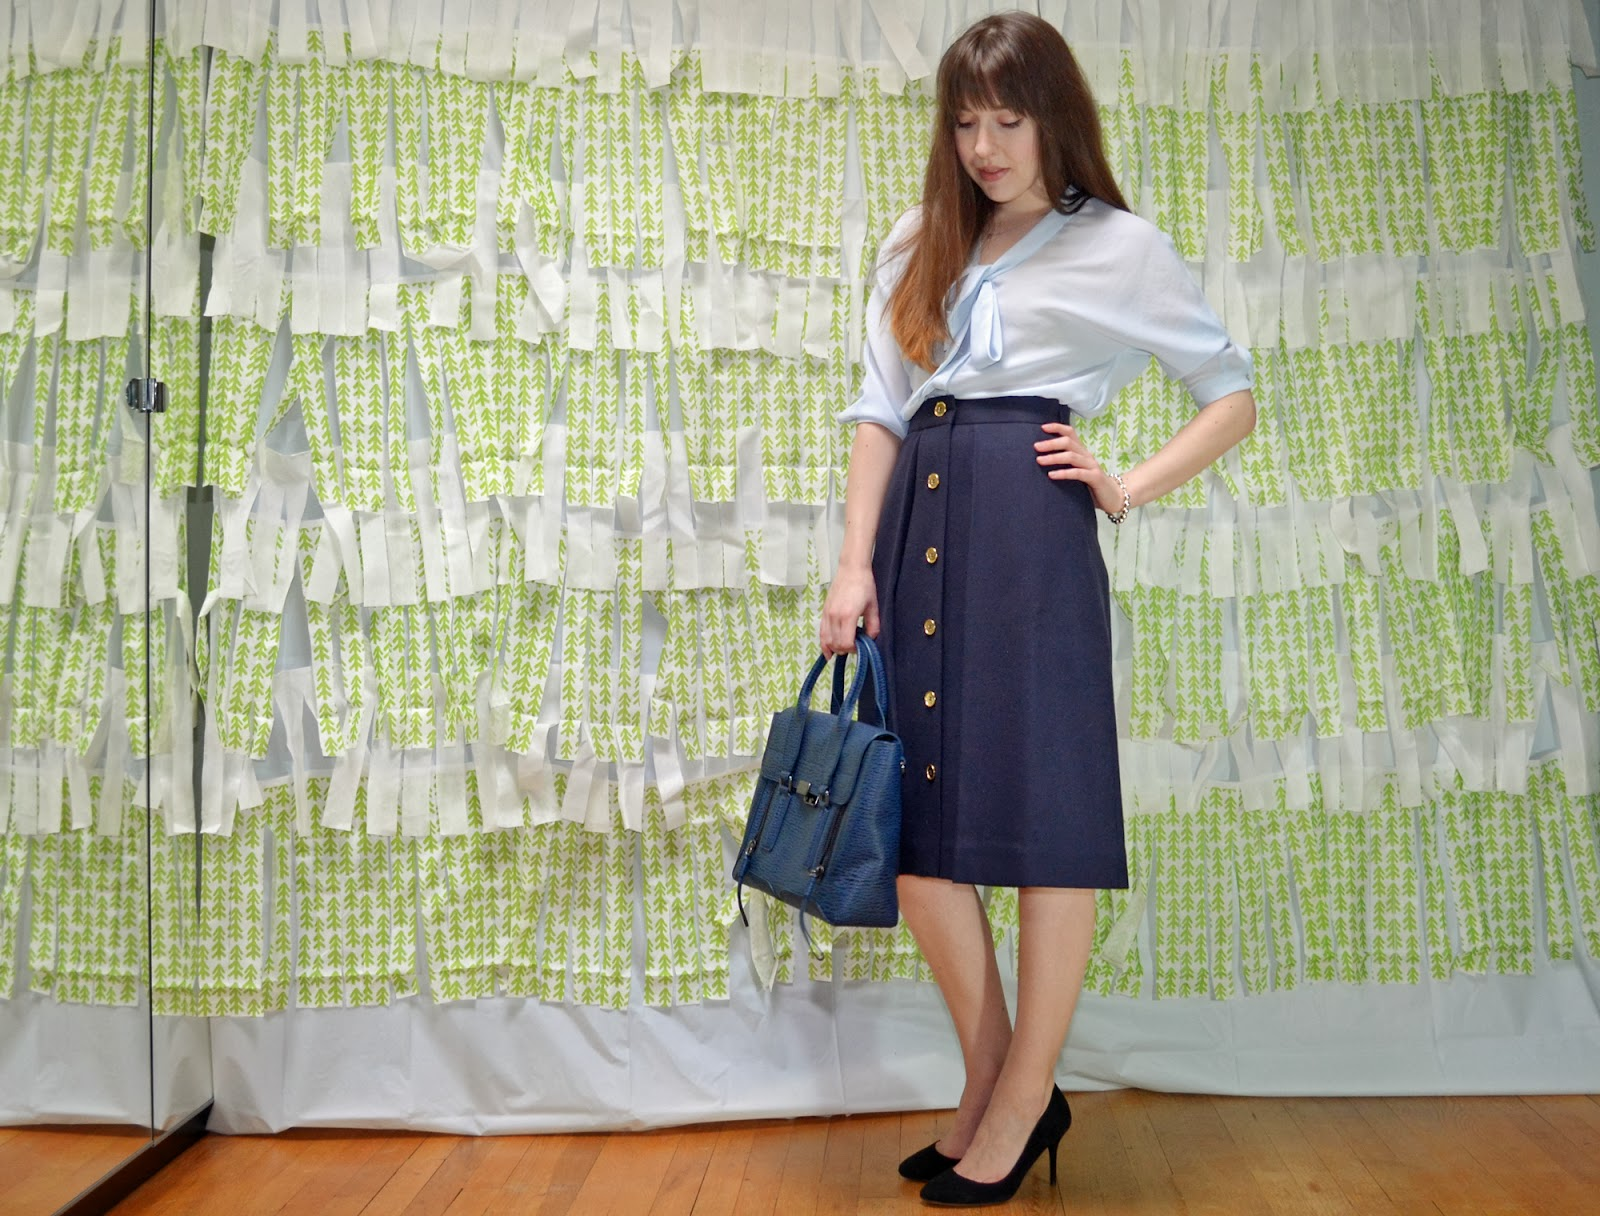 OOTD midi skirt Façonnable Zara outfit pashli phillip lim fashionista